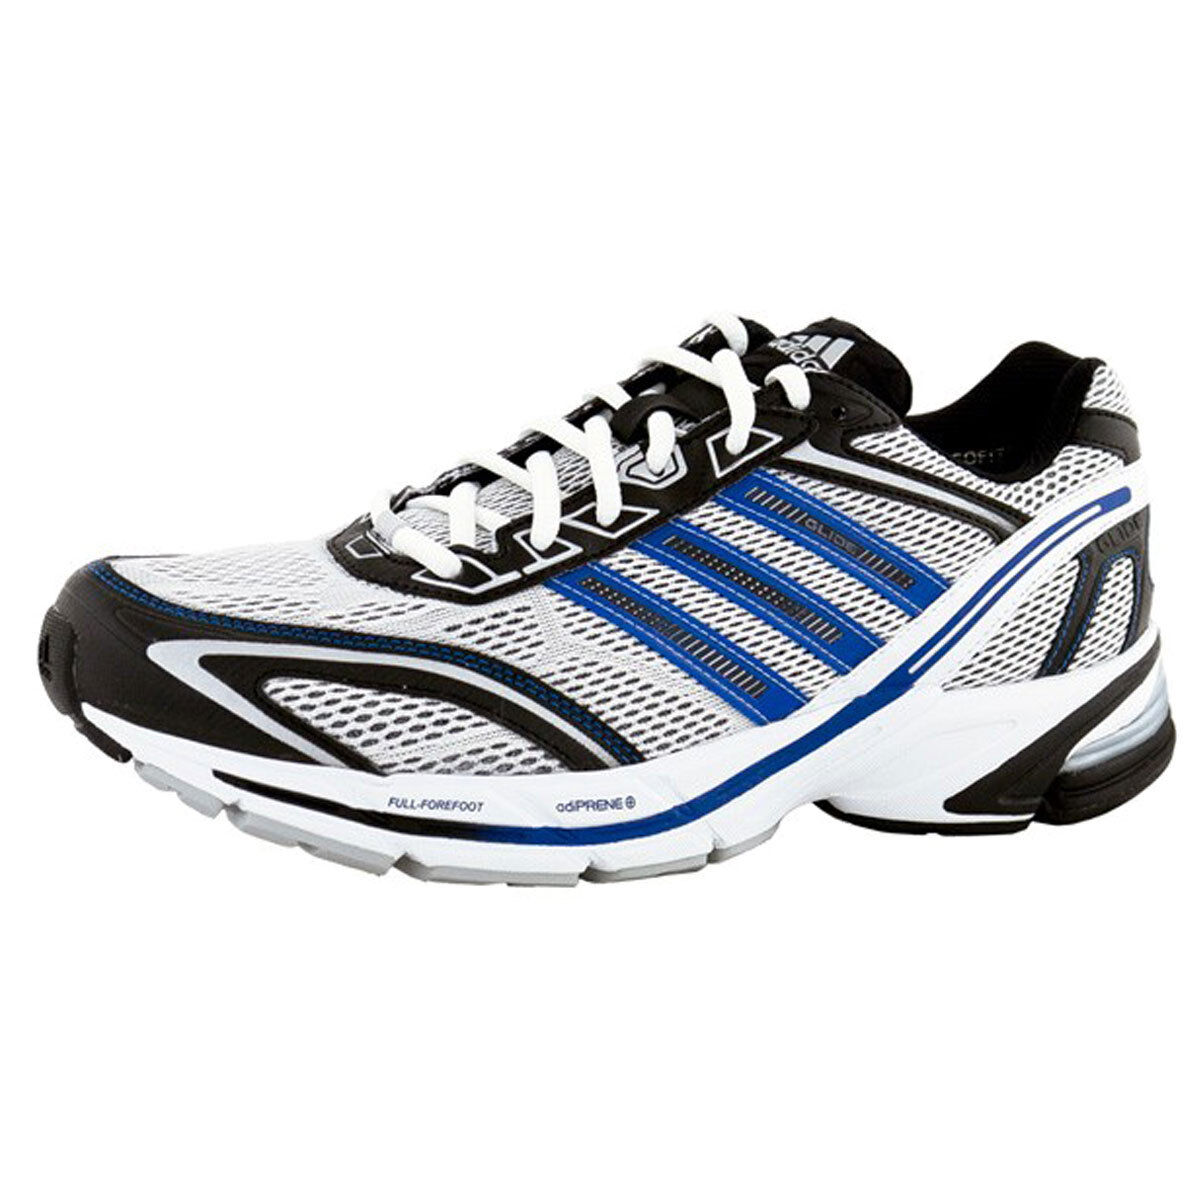 Adidas Supernova Trainers Glide 2 M Running Trainers Supernova  Hombre Talla 221b4e